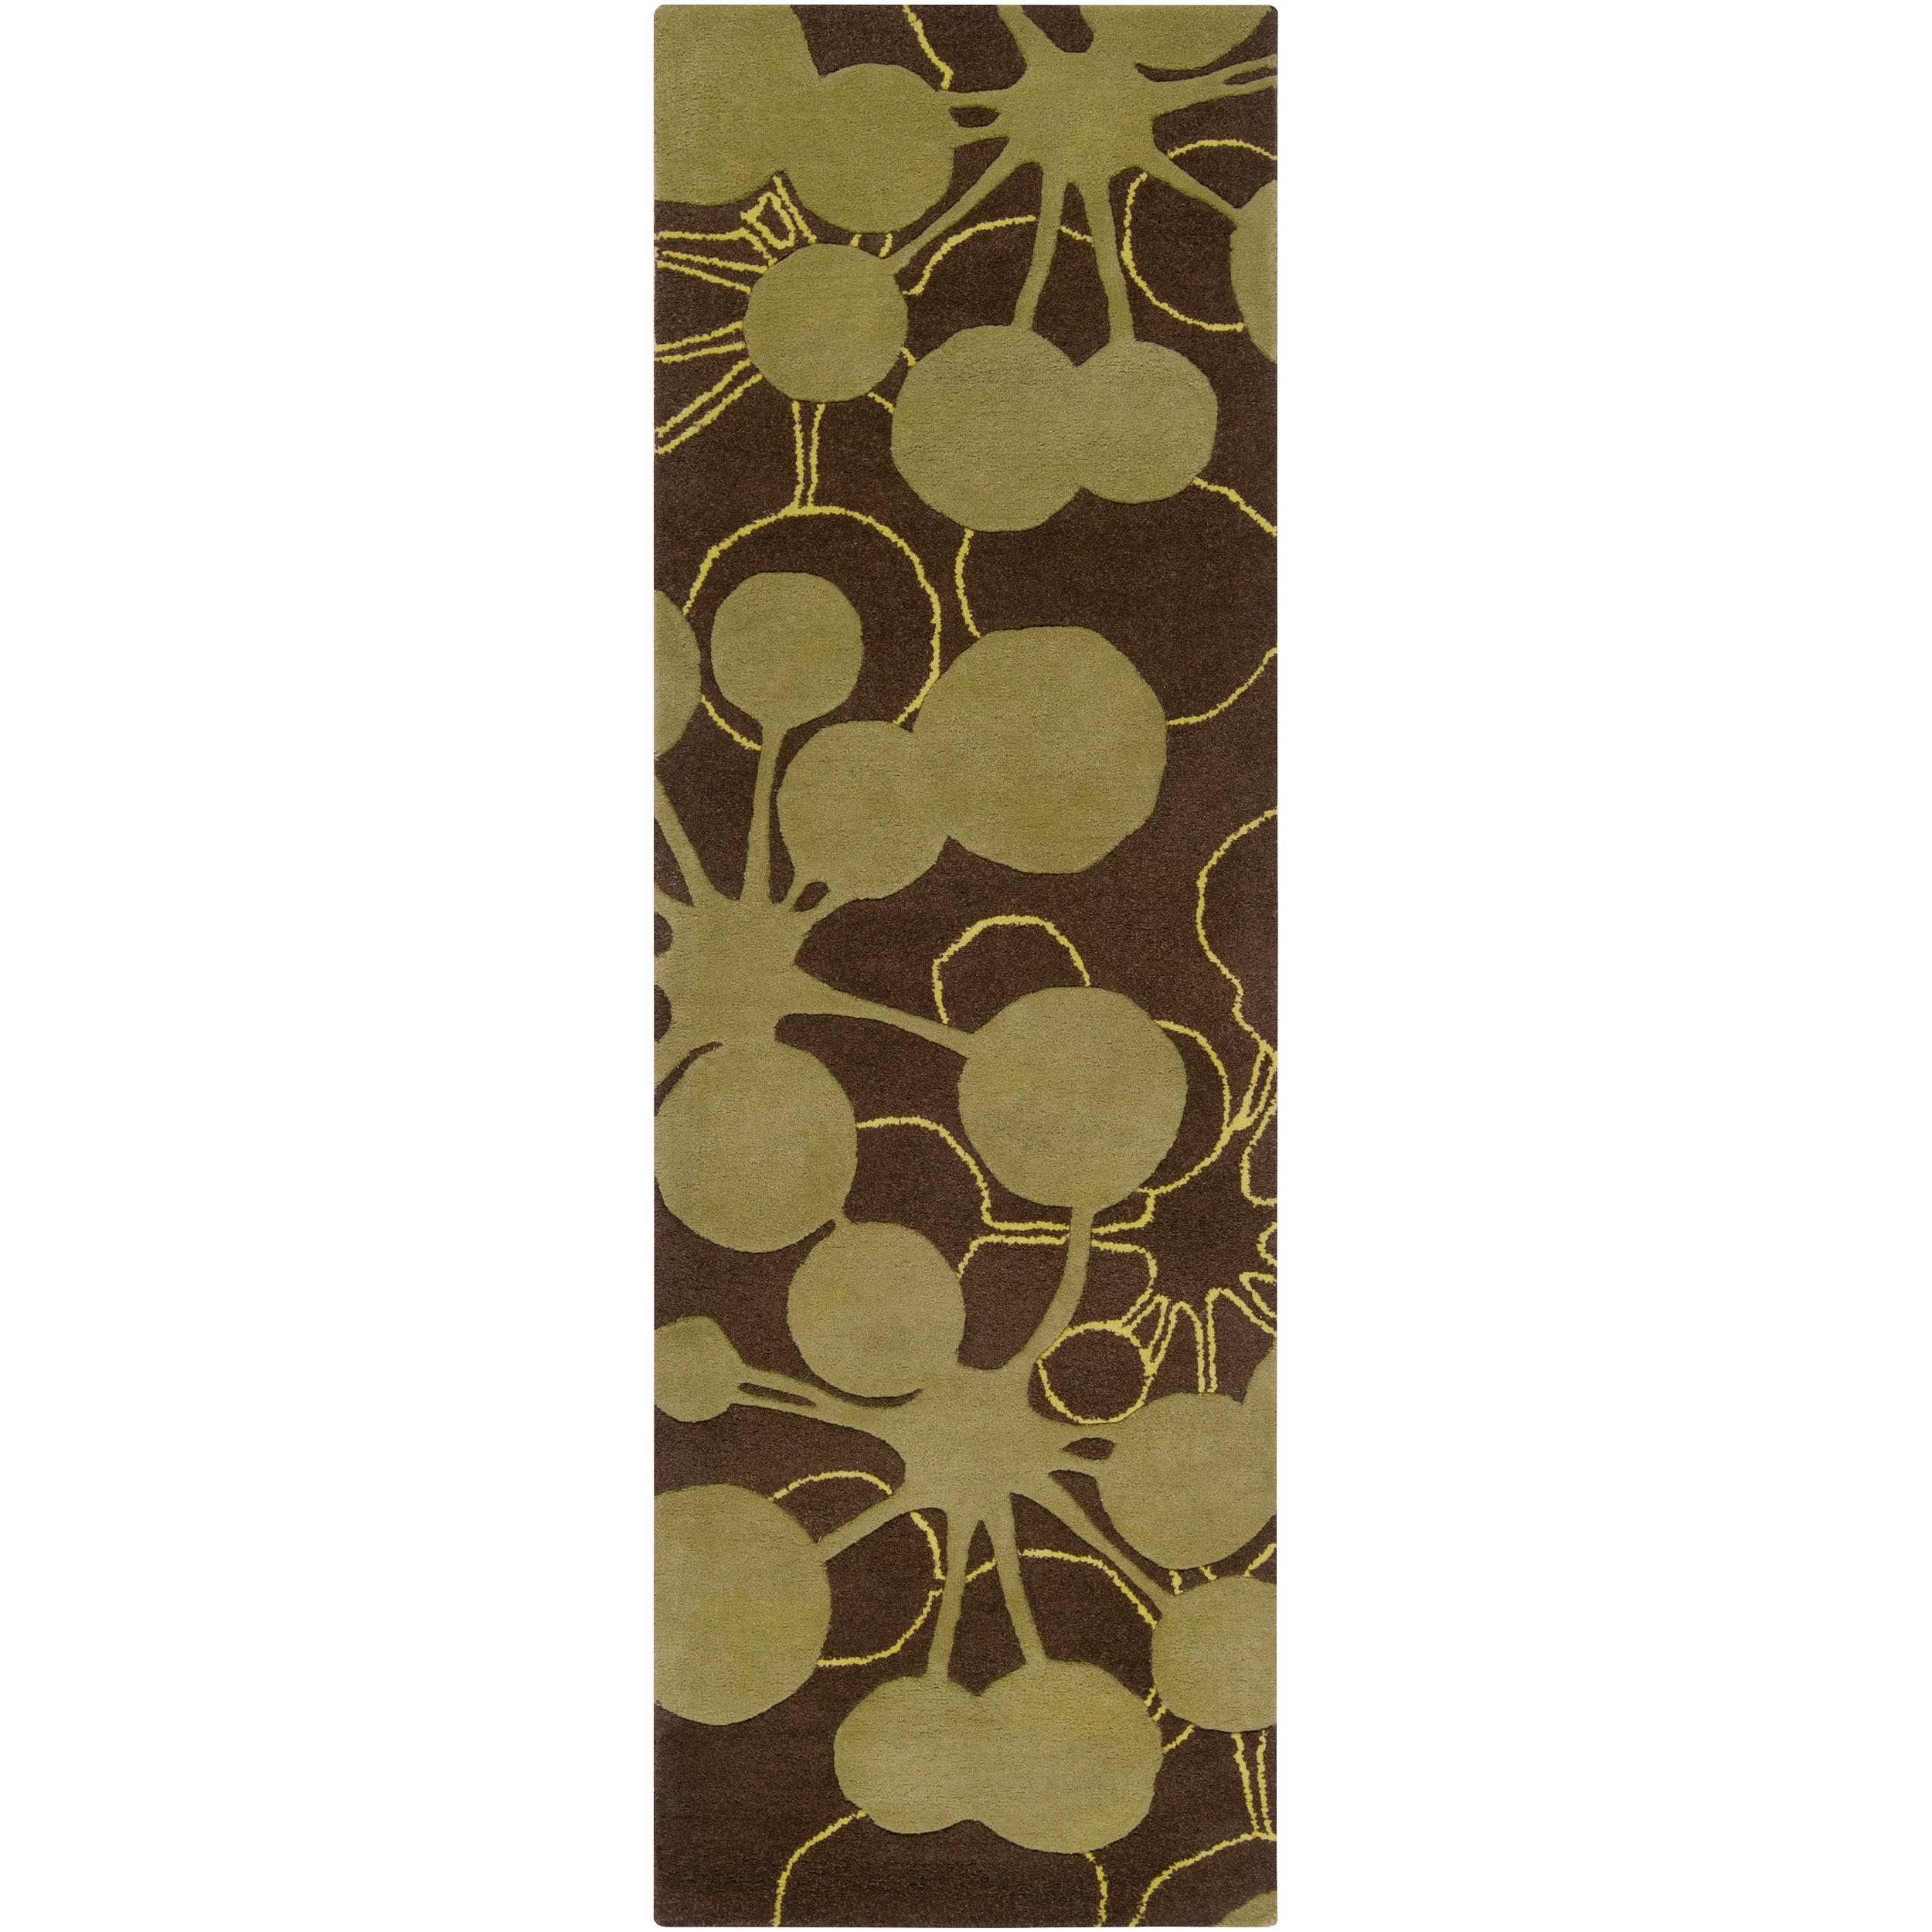 Jef Designs Hand-tufted Brown Torrent Geometric Wool Rug (2'6 x 8')